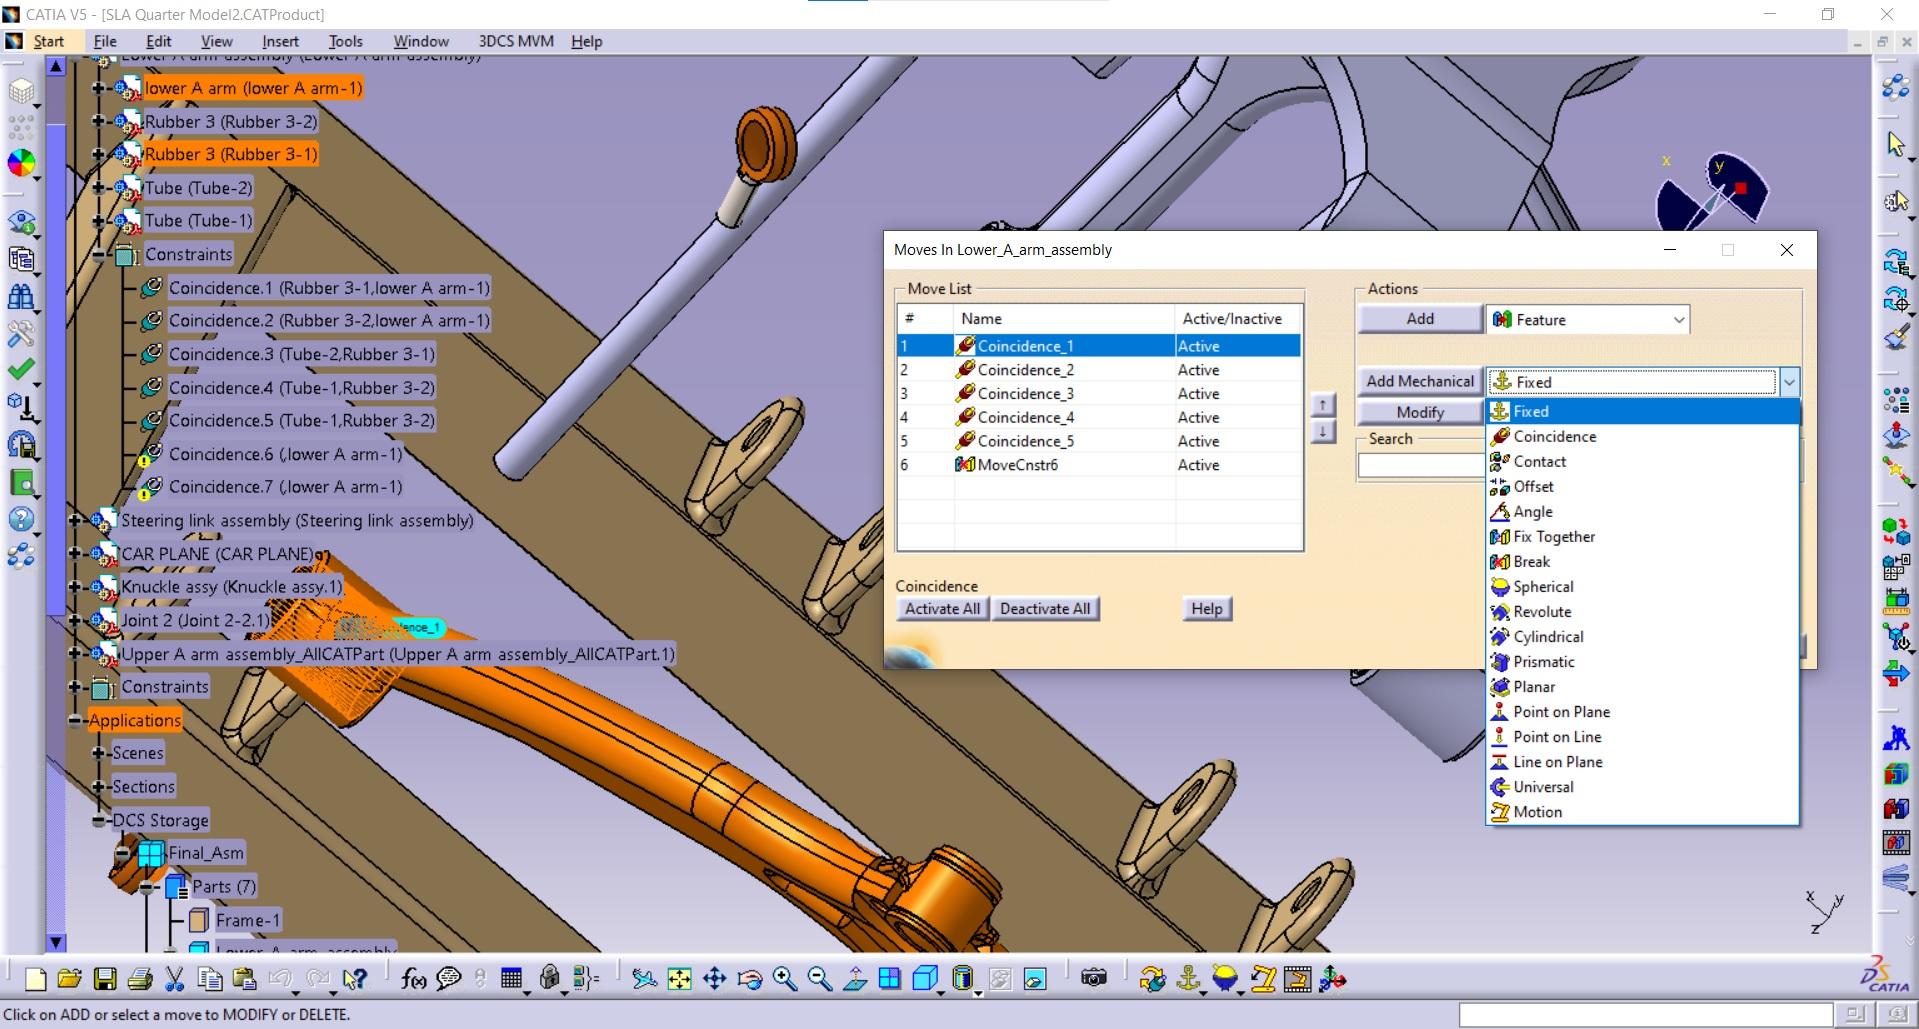 DCS MVM Mechanical Move library